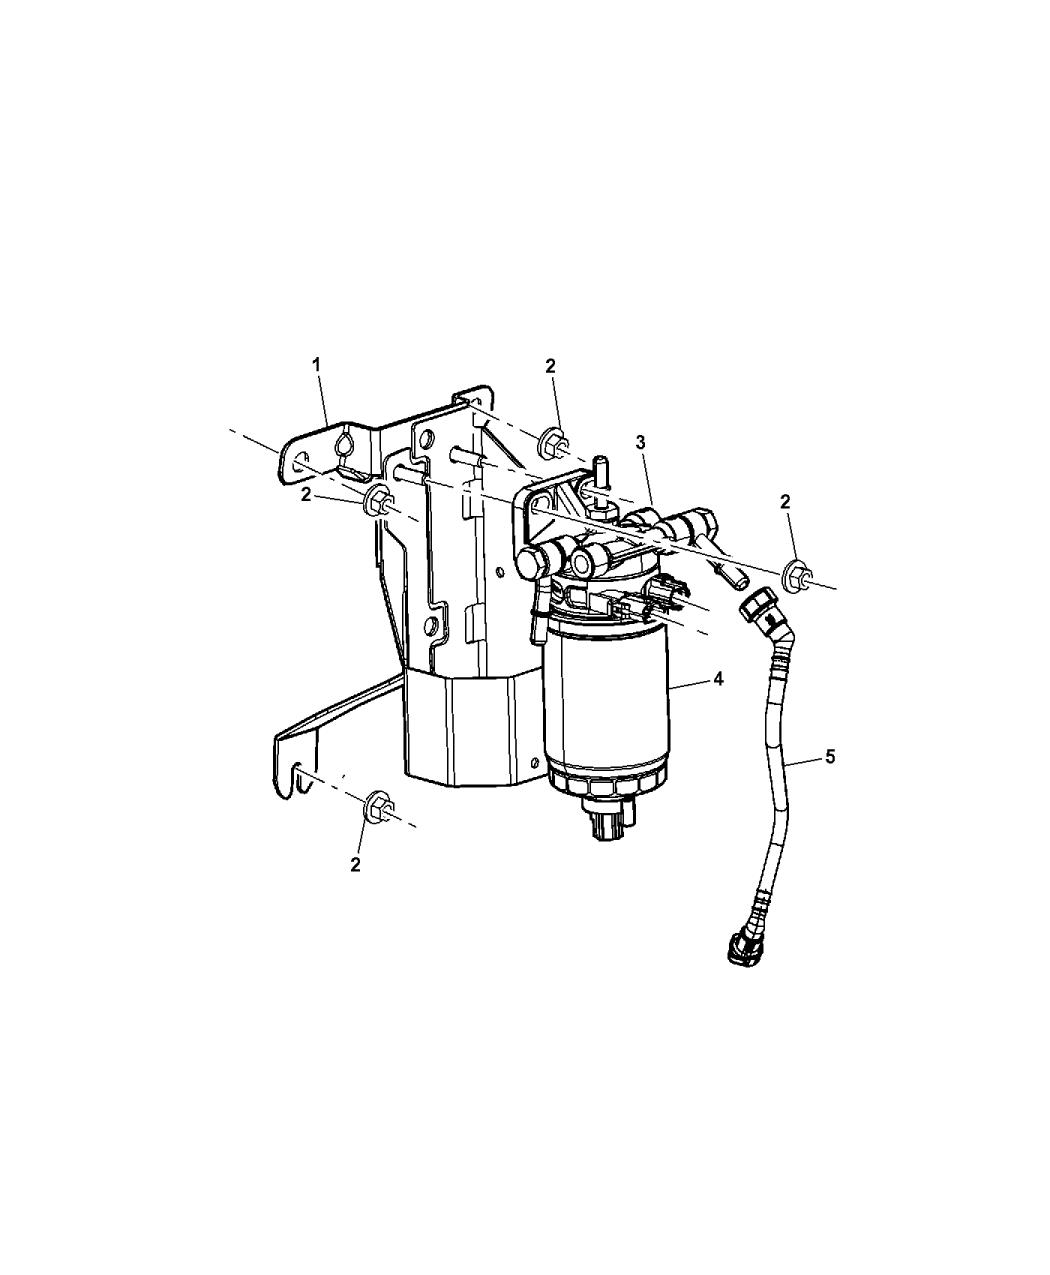 2009 Dodge Nitro Fuel Filter & Water Separator